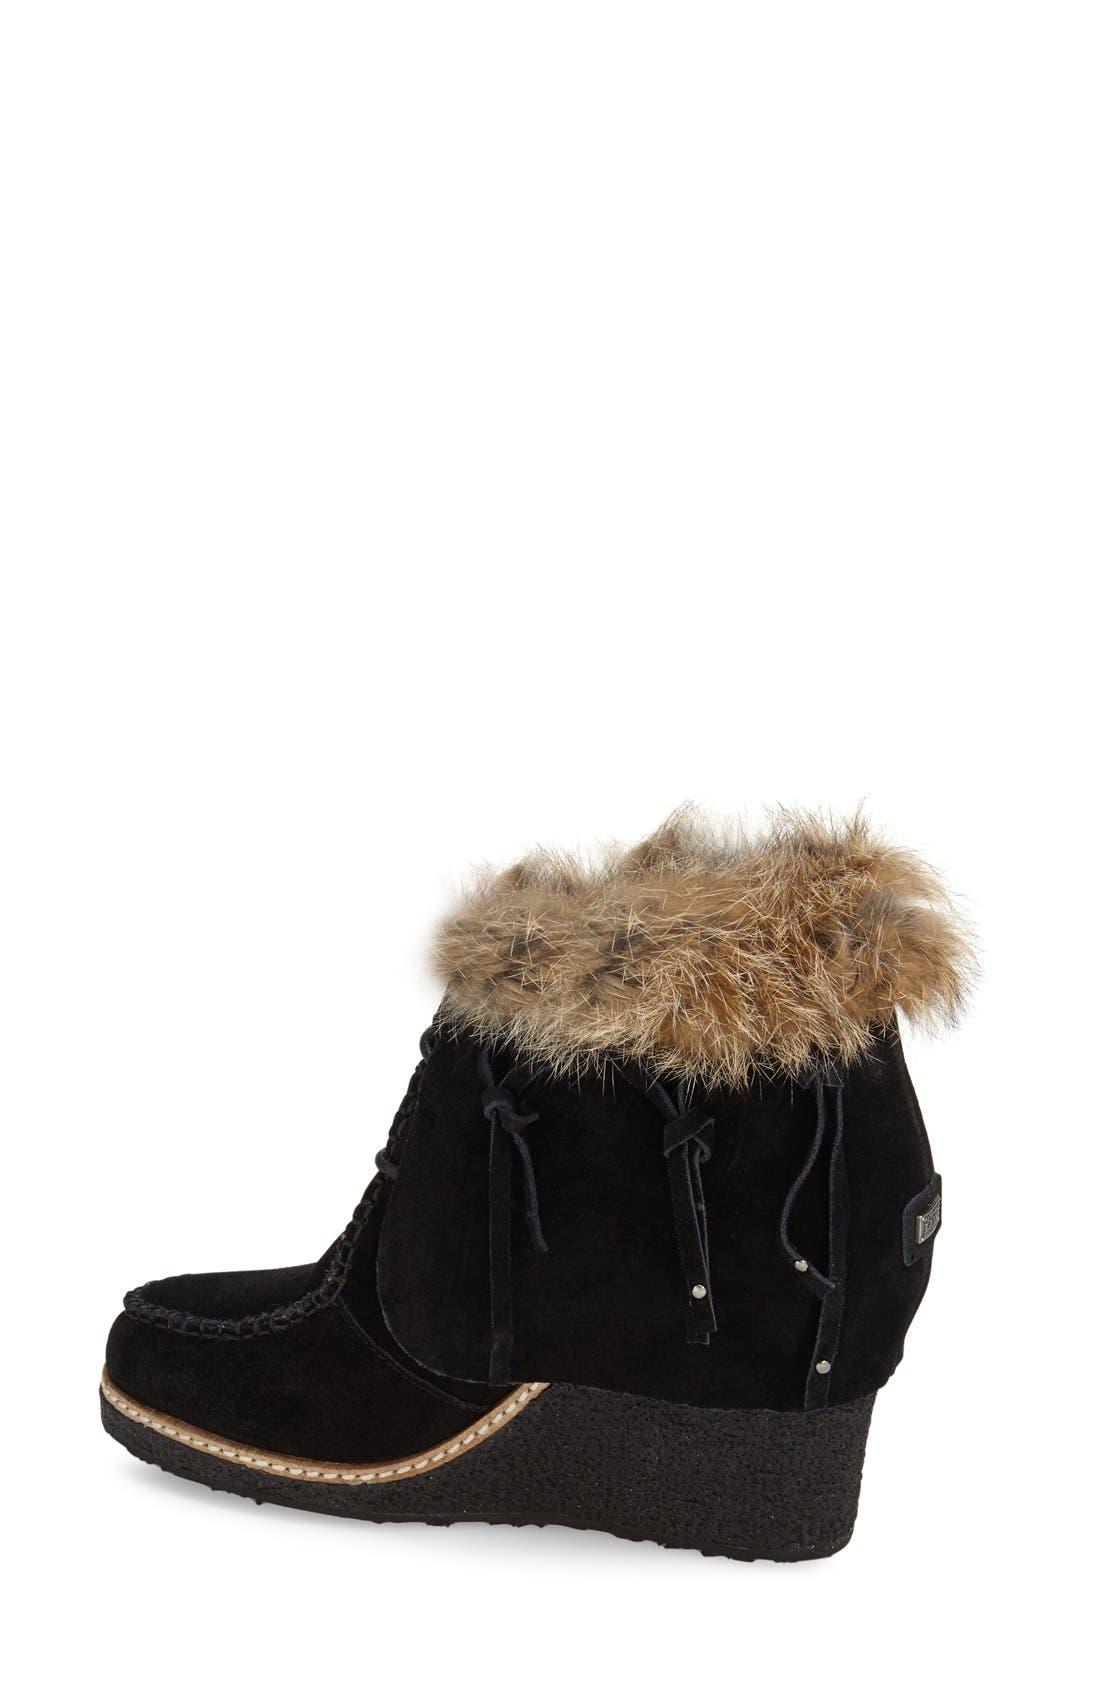 Alternate Image 2  - Australia Luxe Collective 'Mantra' Genuine Shearling & Genuine Rabbit Fur Boot (Women)